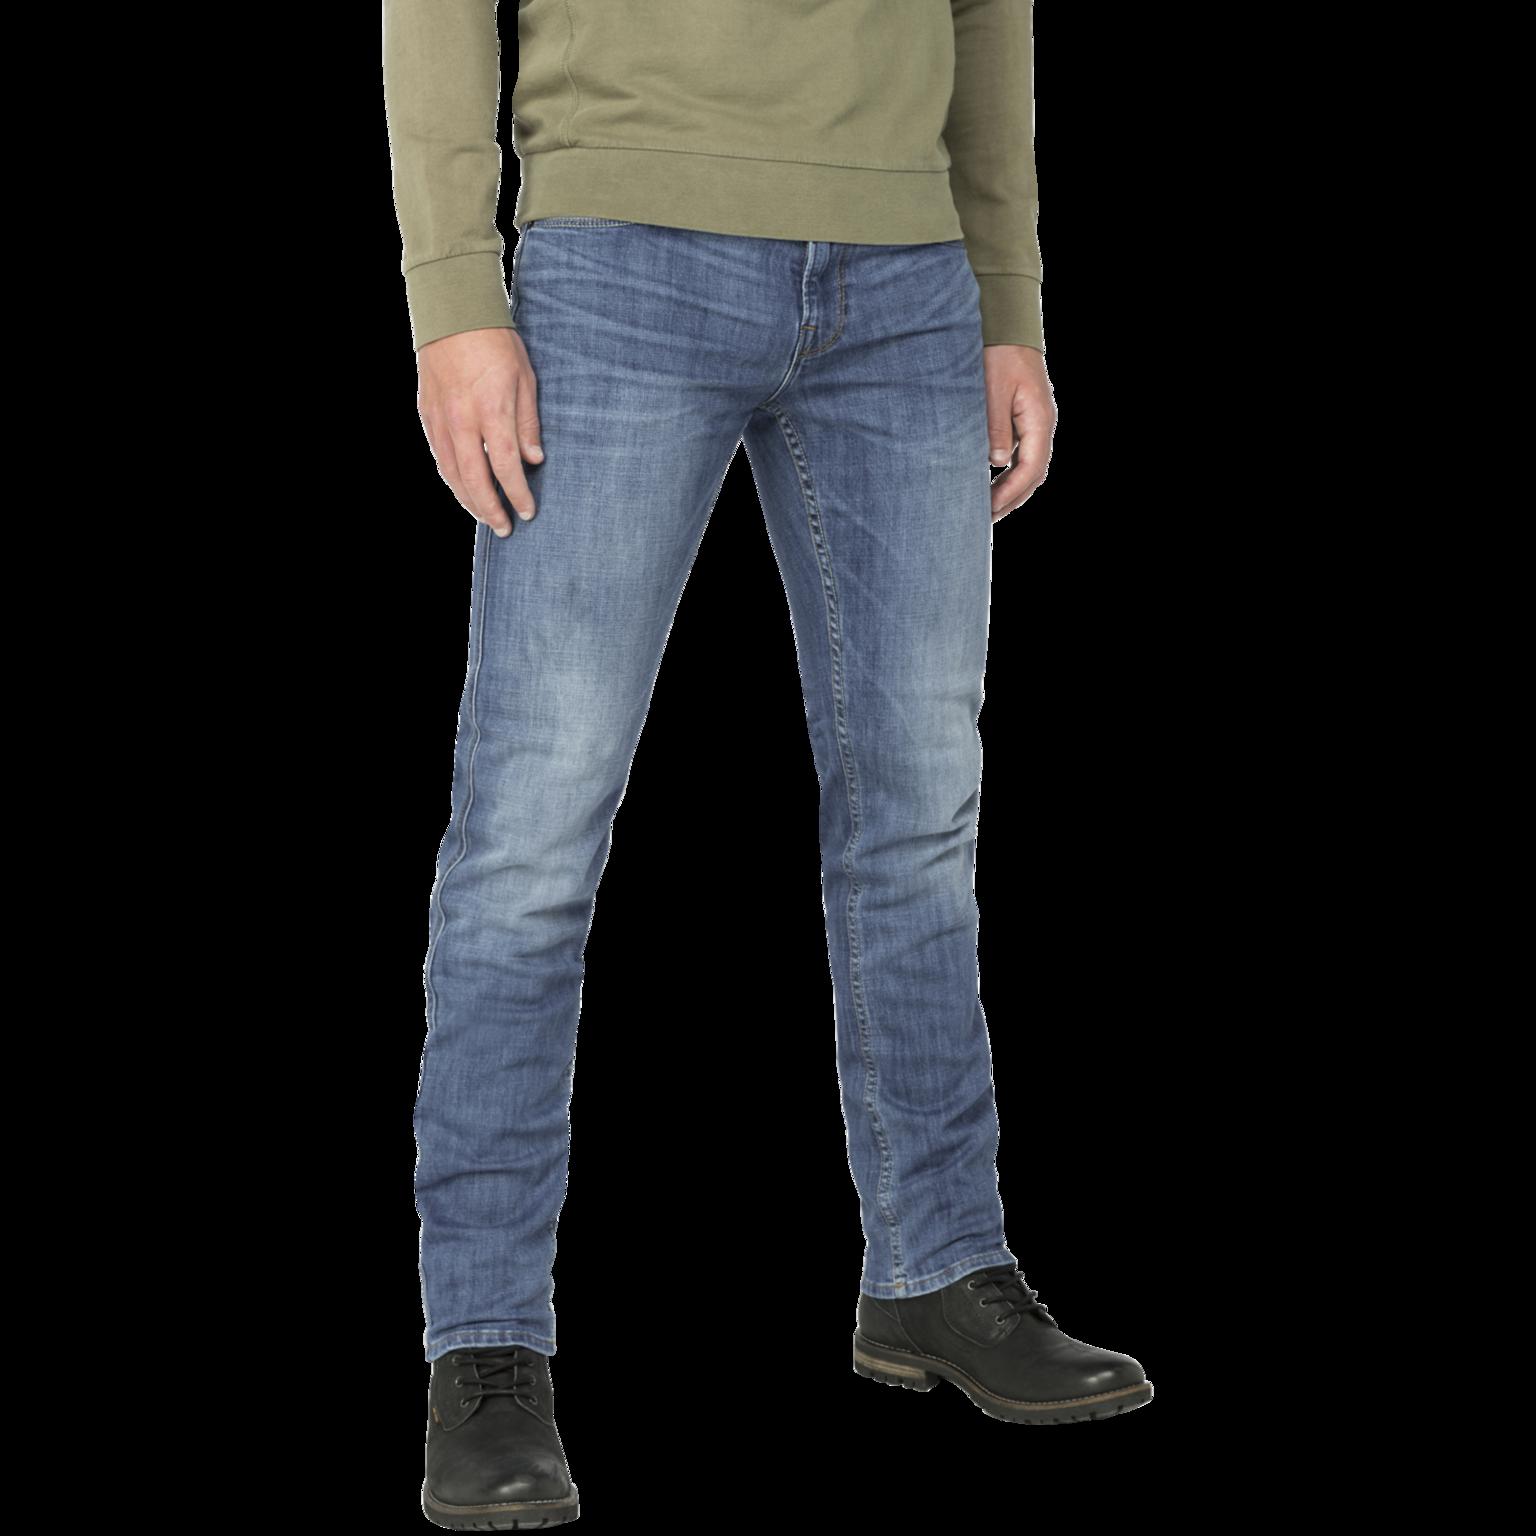 Jeans PME Legend - Nightflight